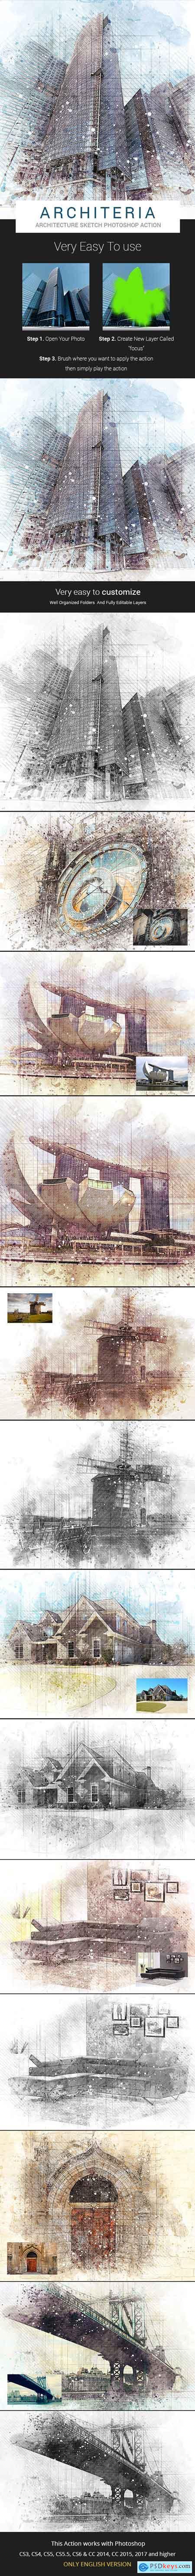 Architeria - Architecture Sketch Photoshop Action 21433278